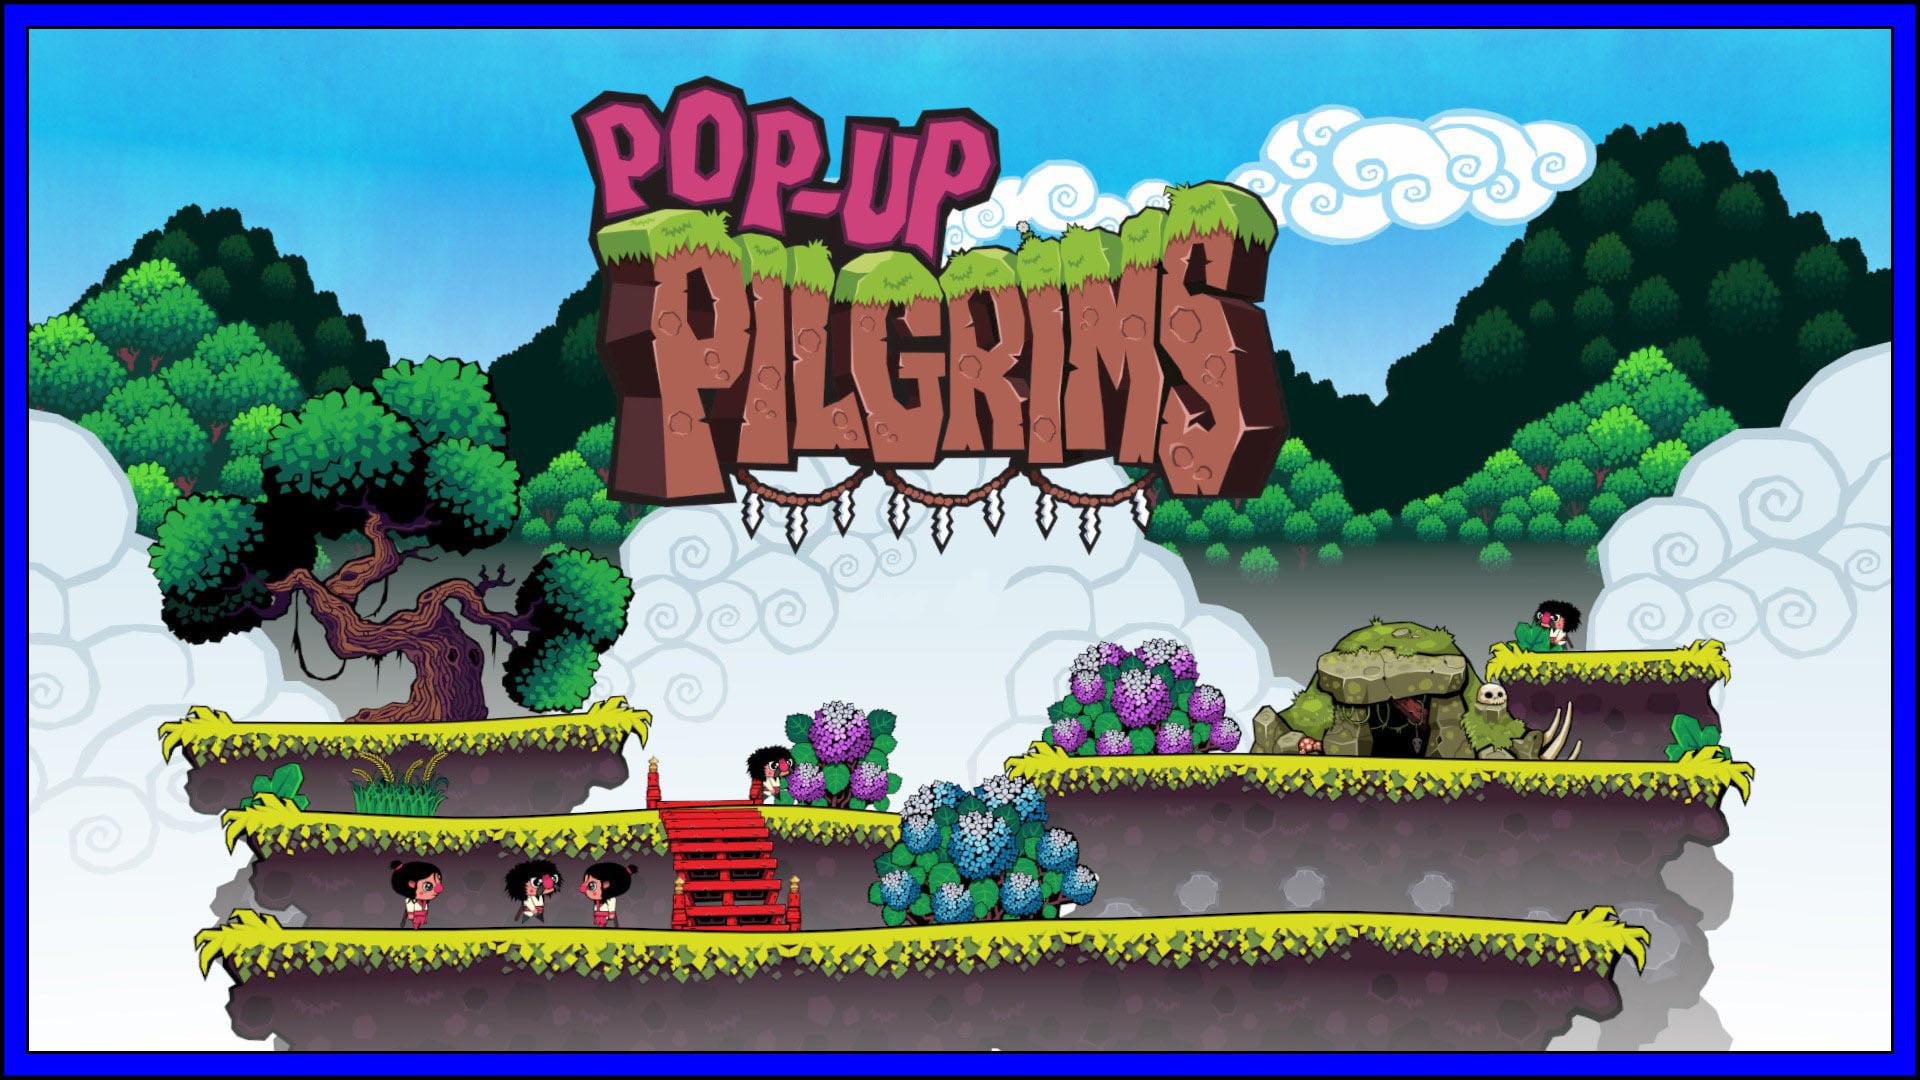 Pop Up Pilgrims Fi3